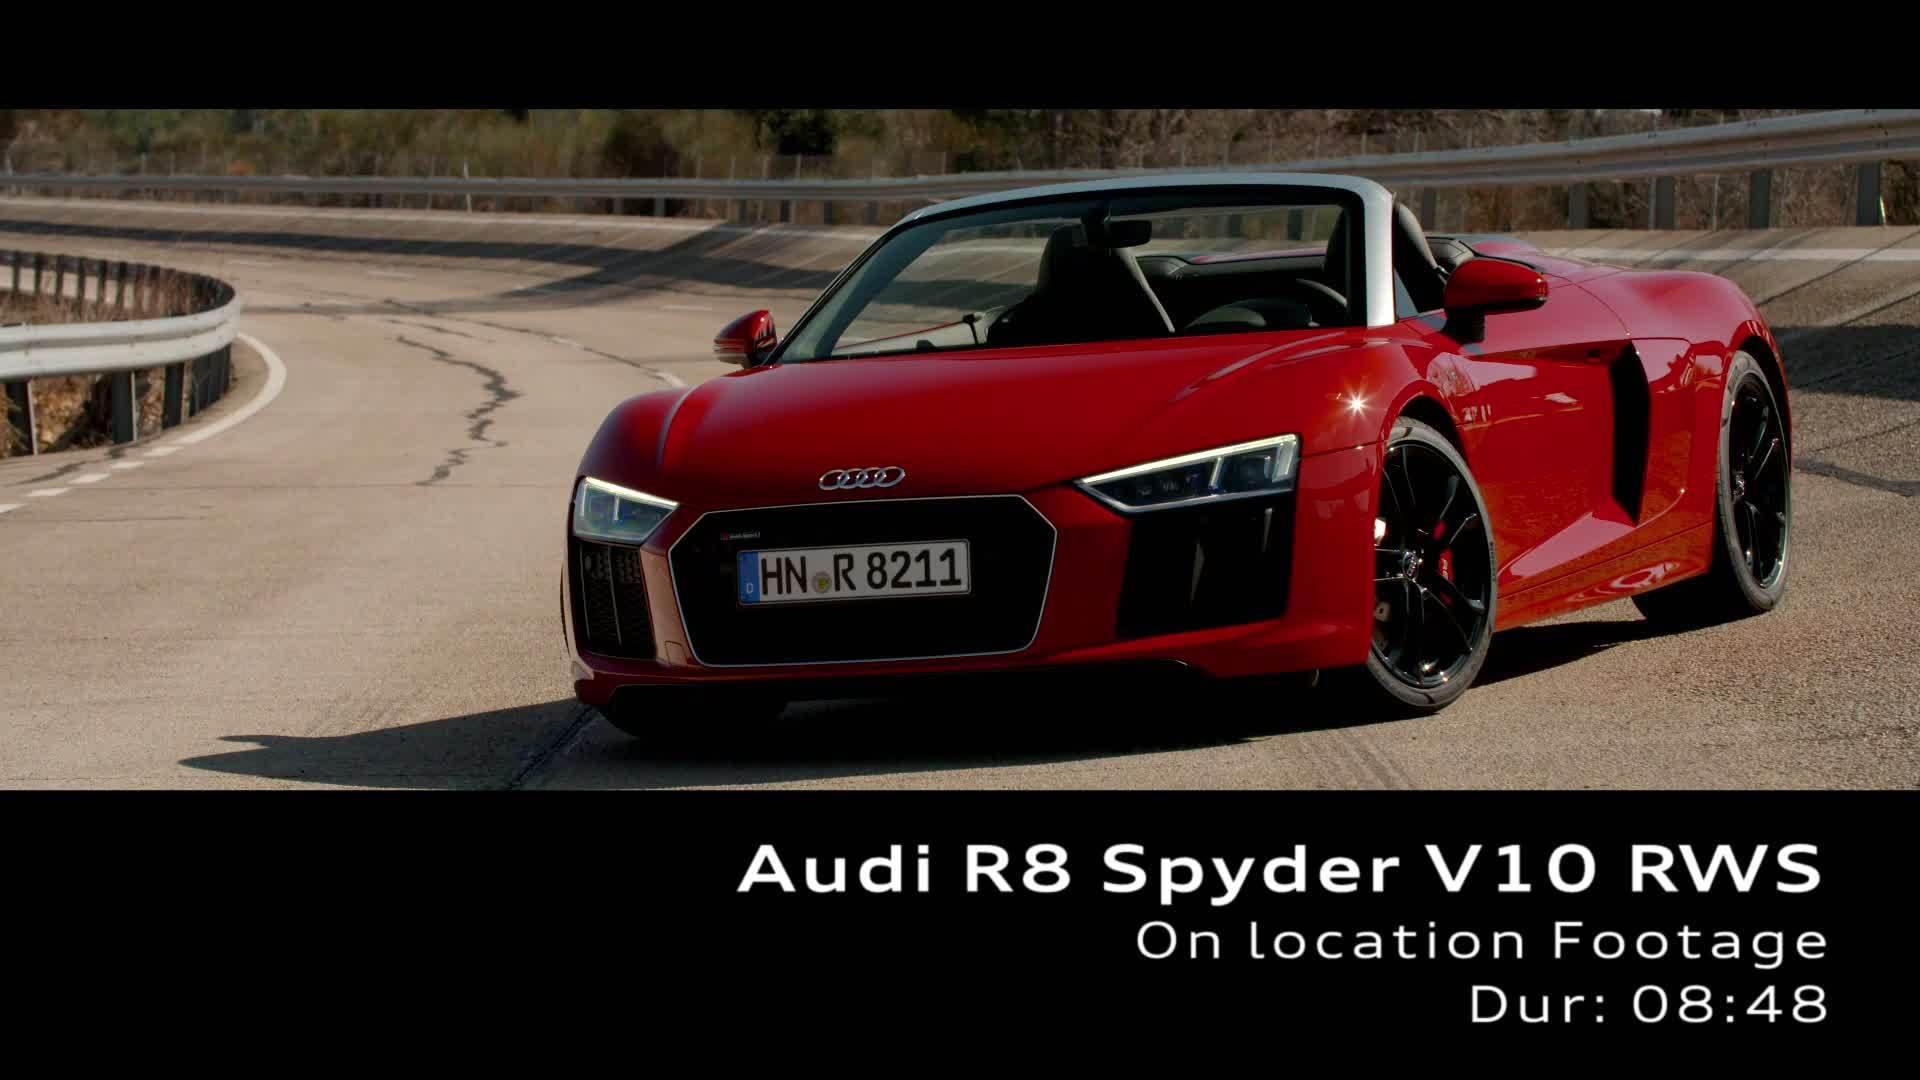 Footage Audi R8 V10 Spyder RWS